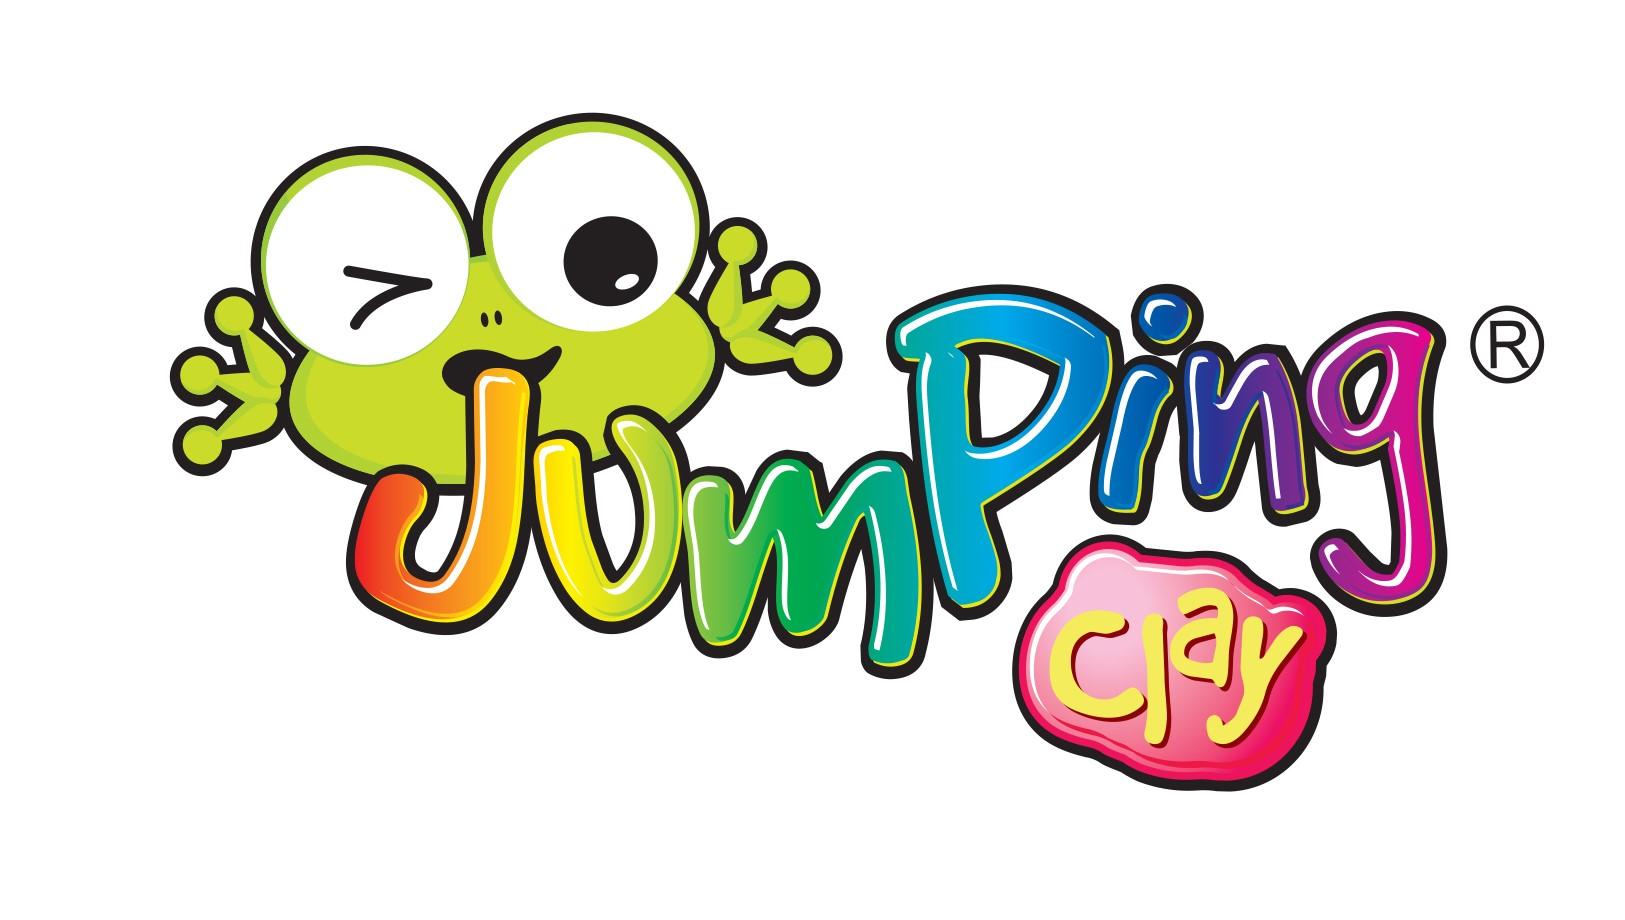 Jump_the quest arte fantastico